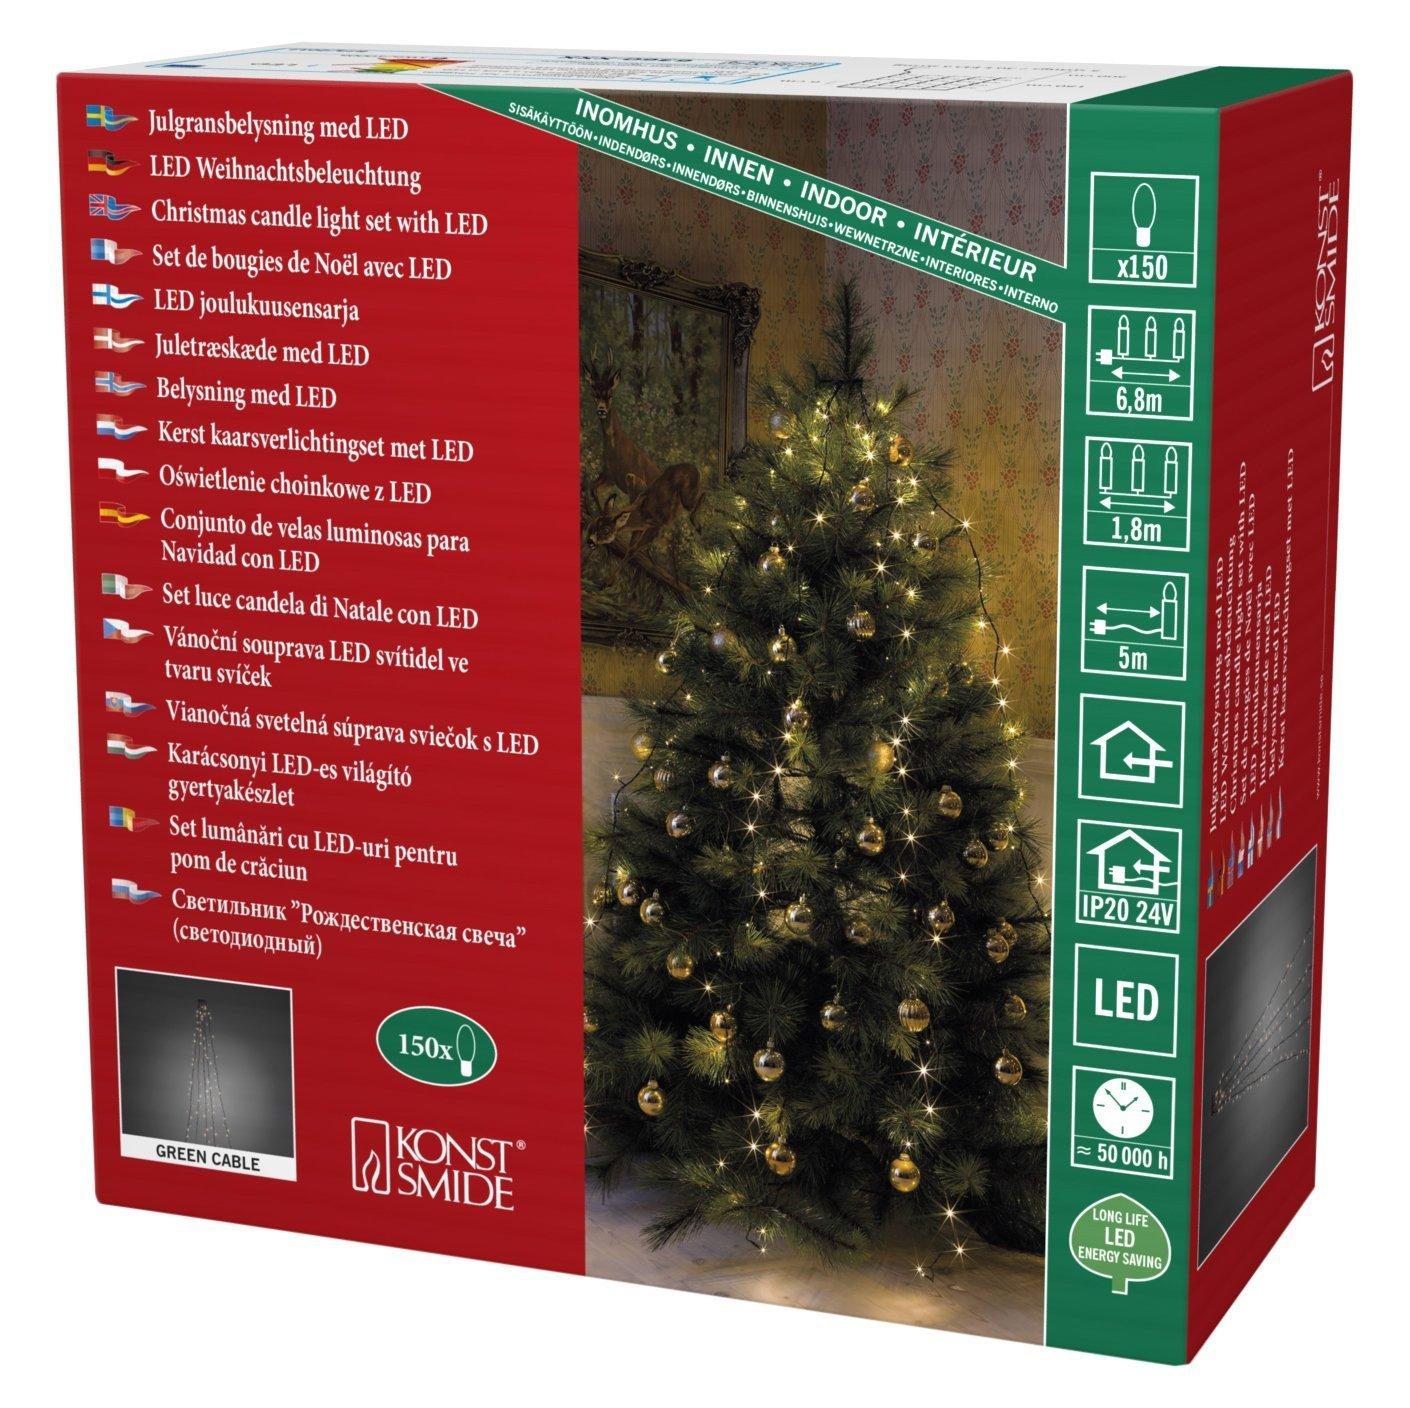 Konstsmide Baum Lichterkette LED amazon